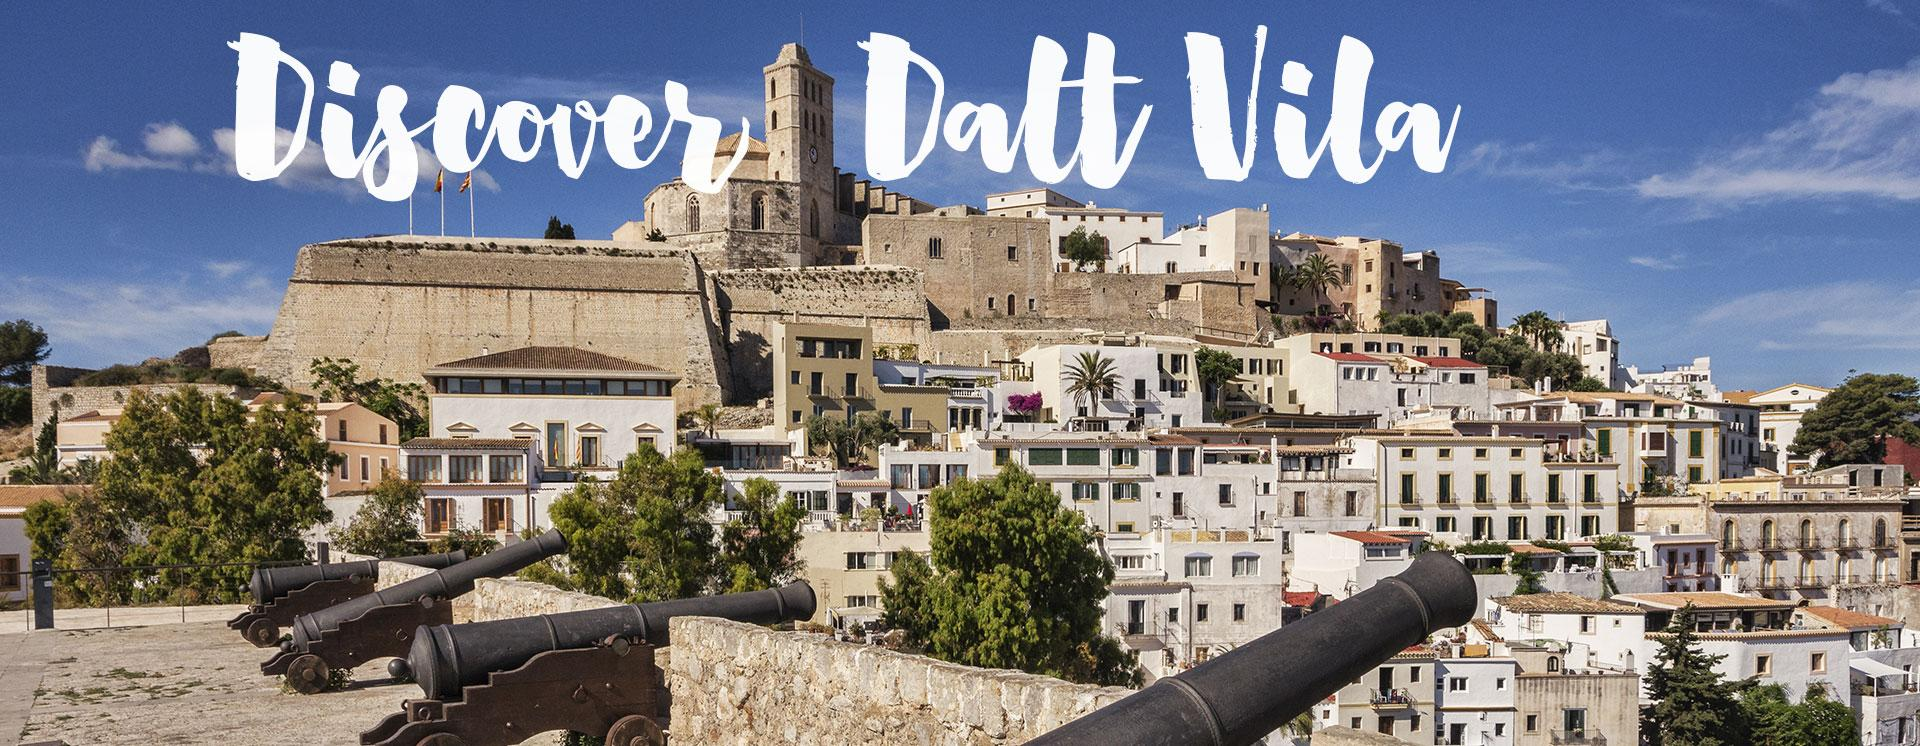 Discover Dalt Vila